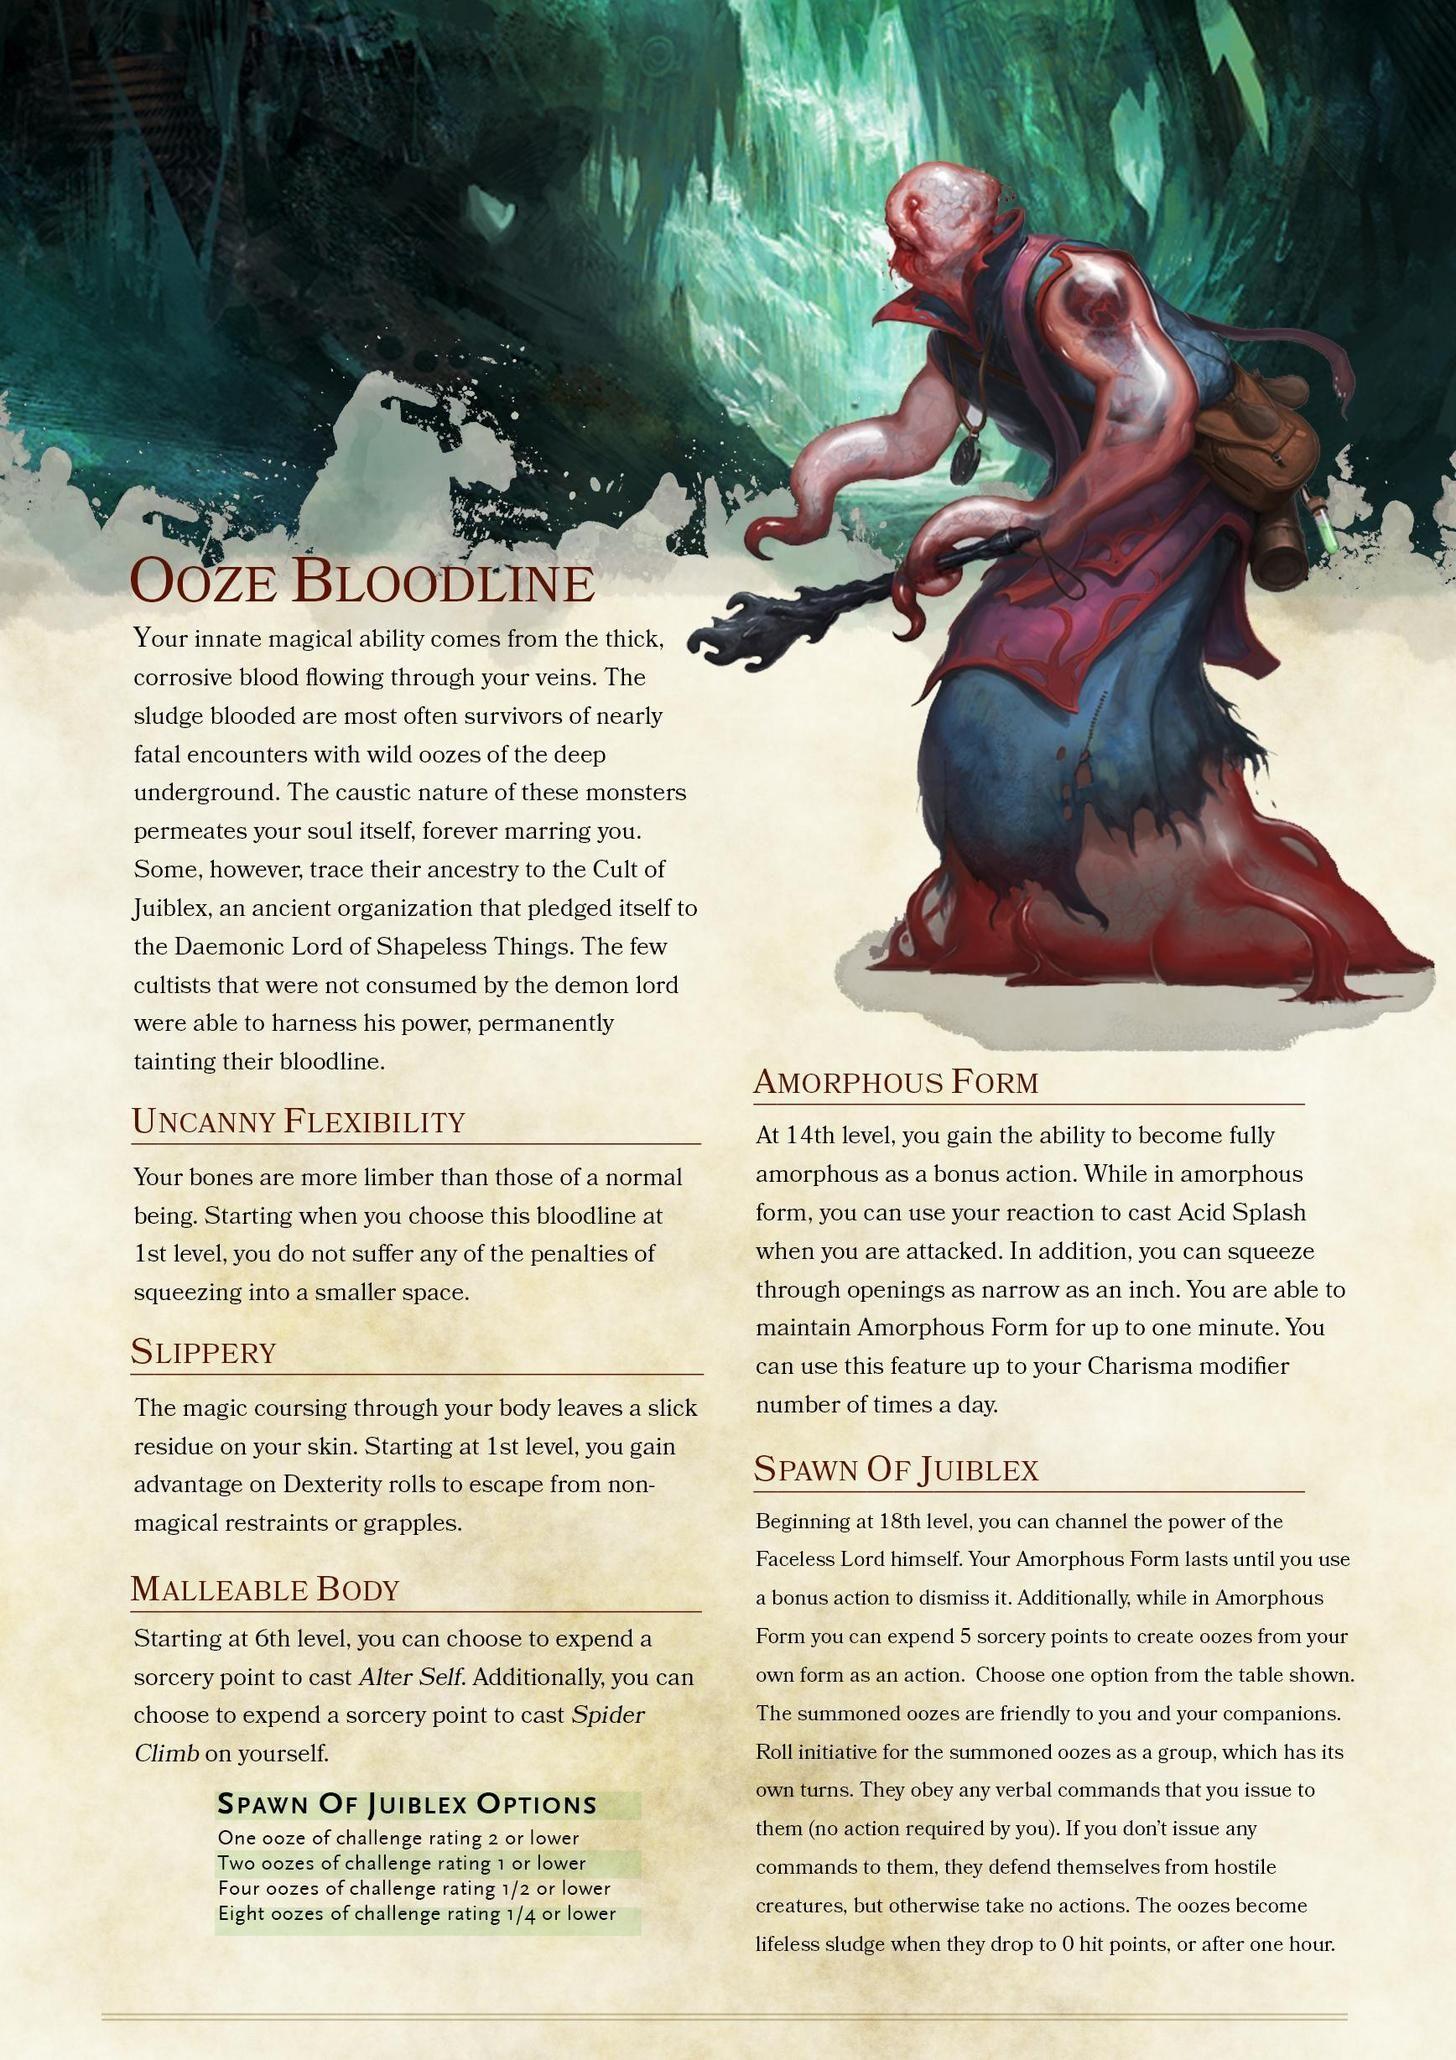 [5E] Sorcerer Bloodline: Ooze Blood In 2020